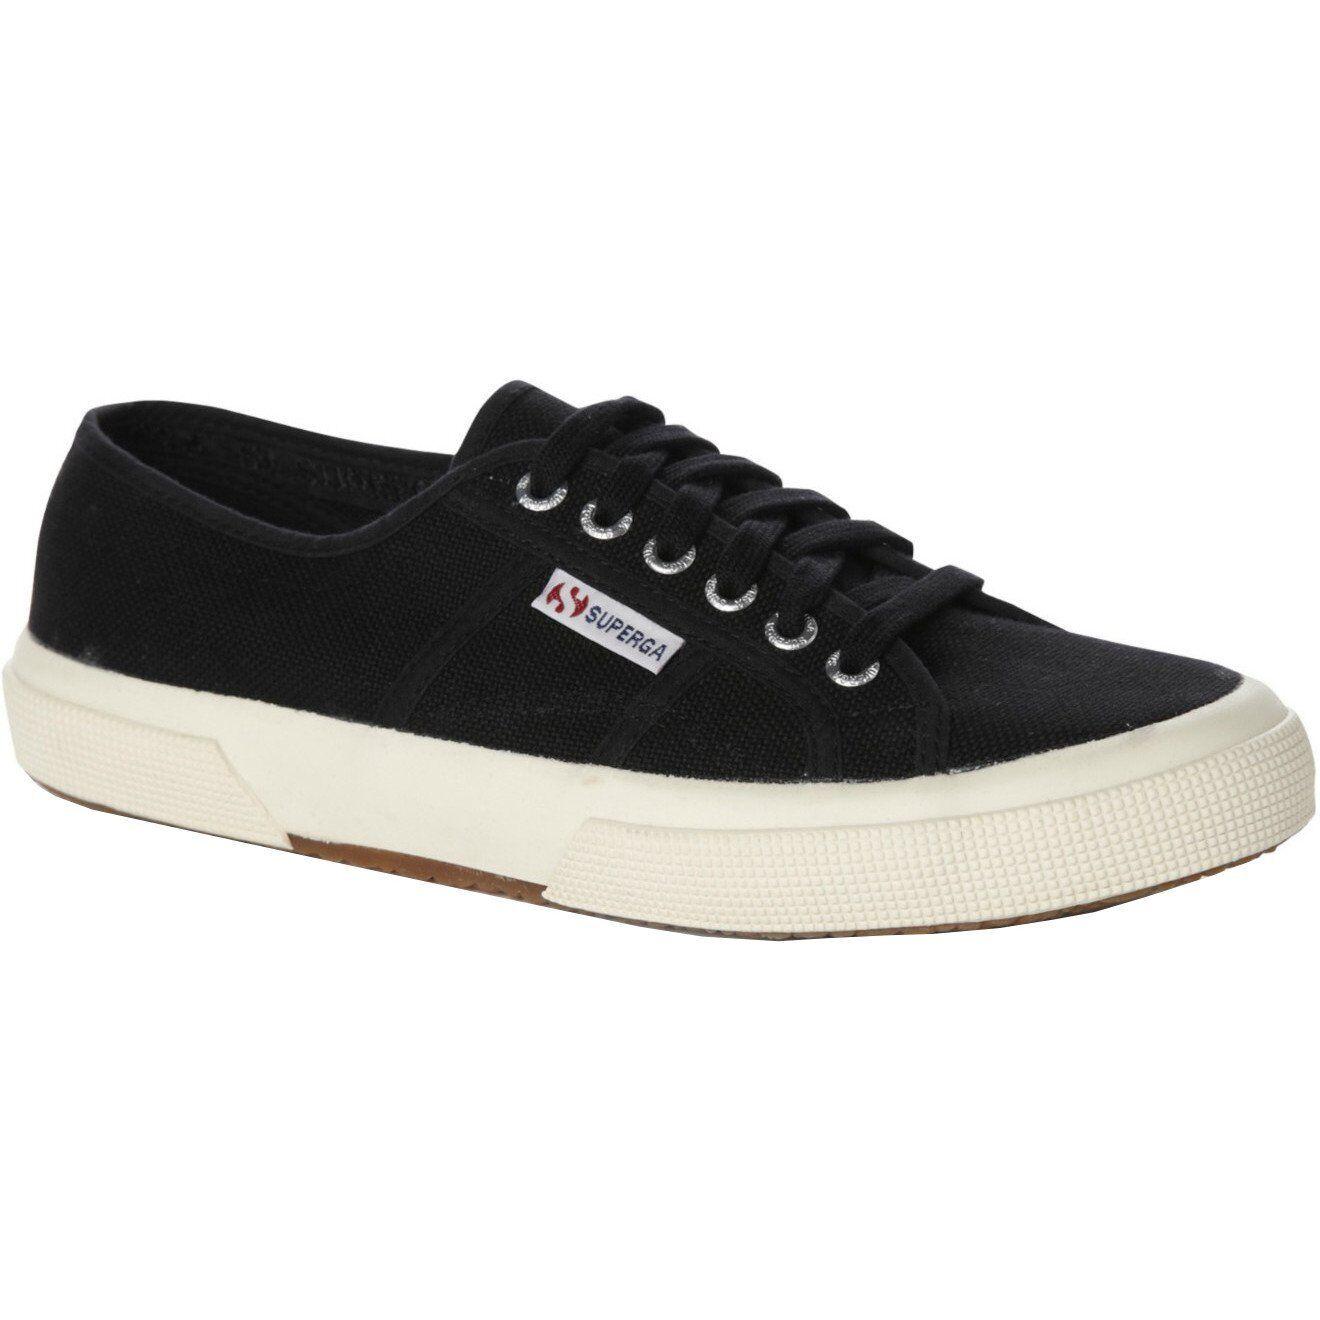 Superga 2750 Cotu Unisex Footwear shoes - Black White All Sizes